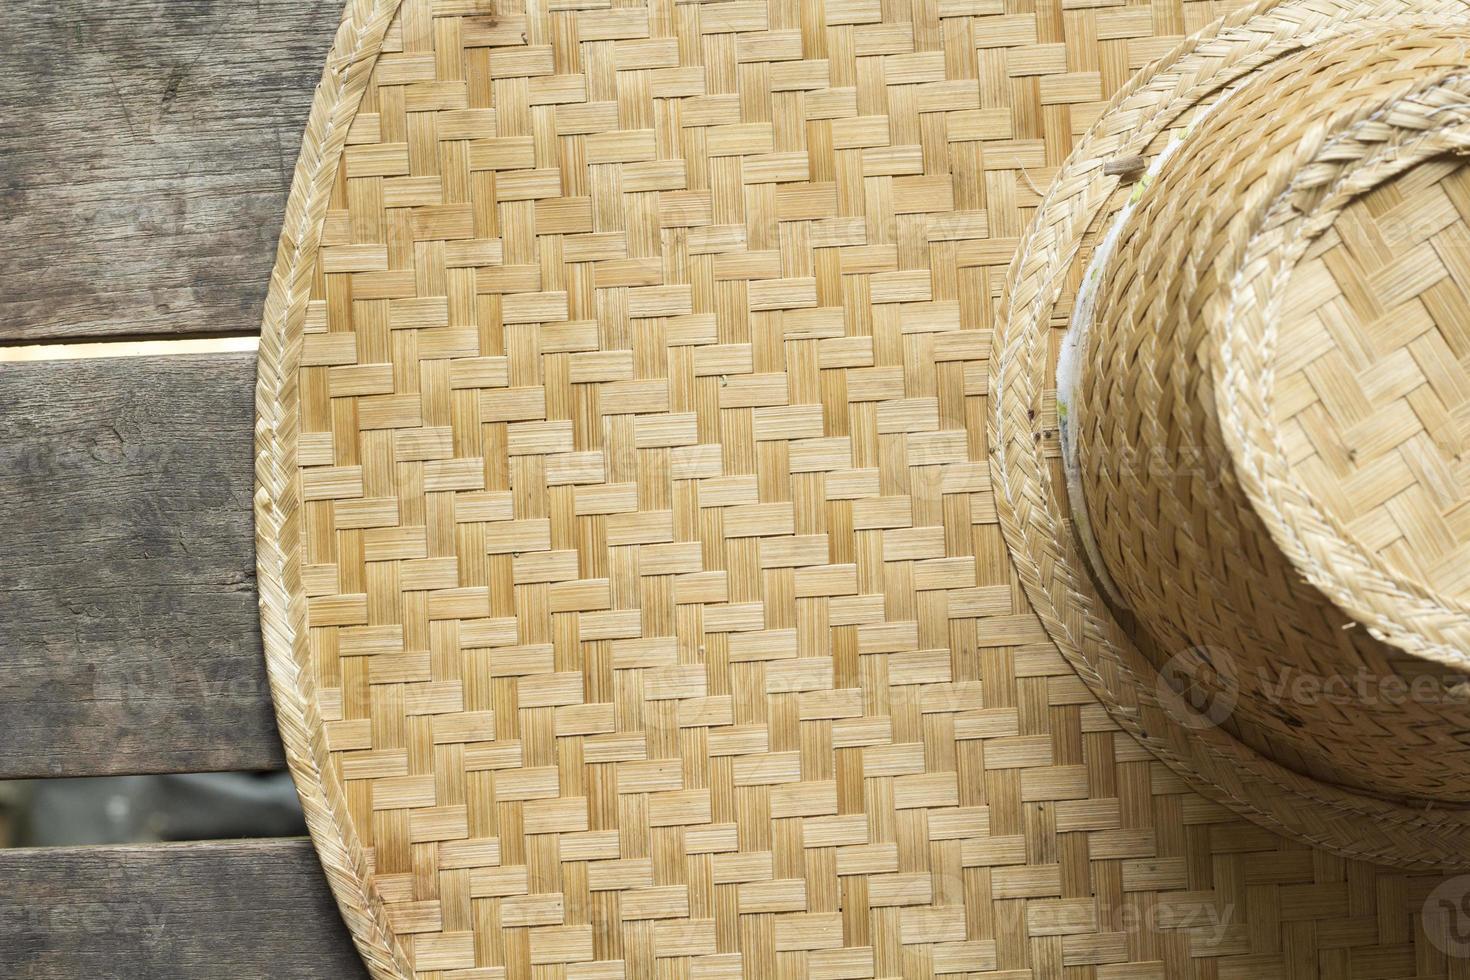 fond d'artisanat en bambou photo